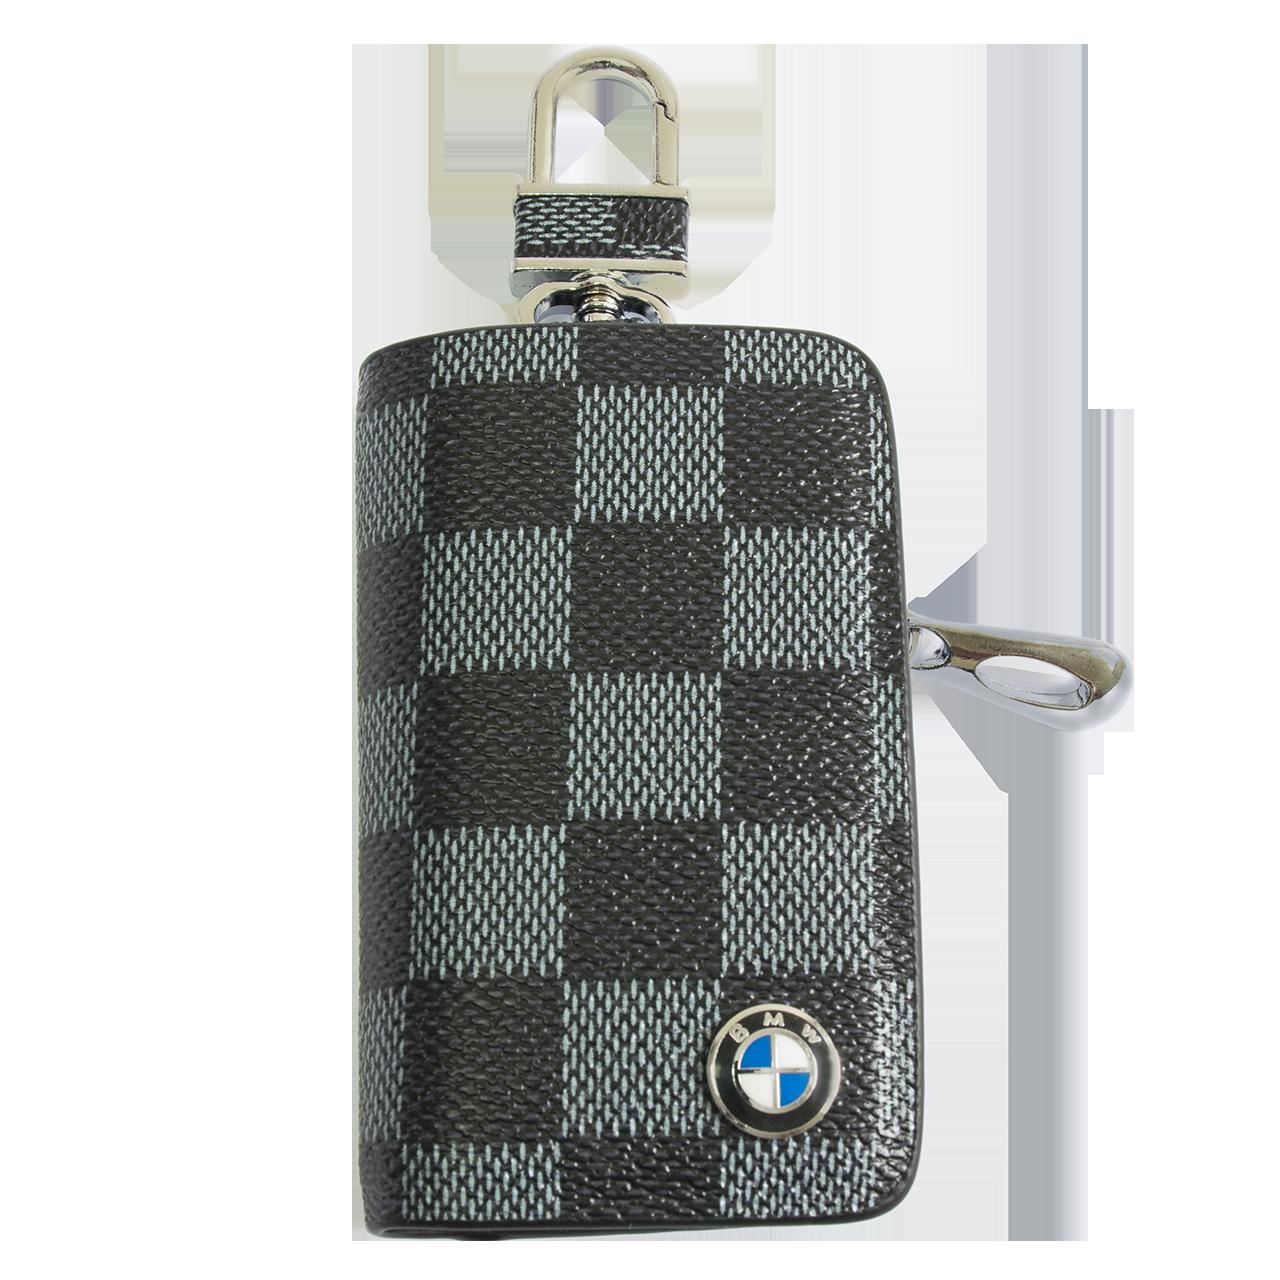 Ключница Carss с логотипом BMW 12013 карбон серый